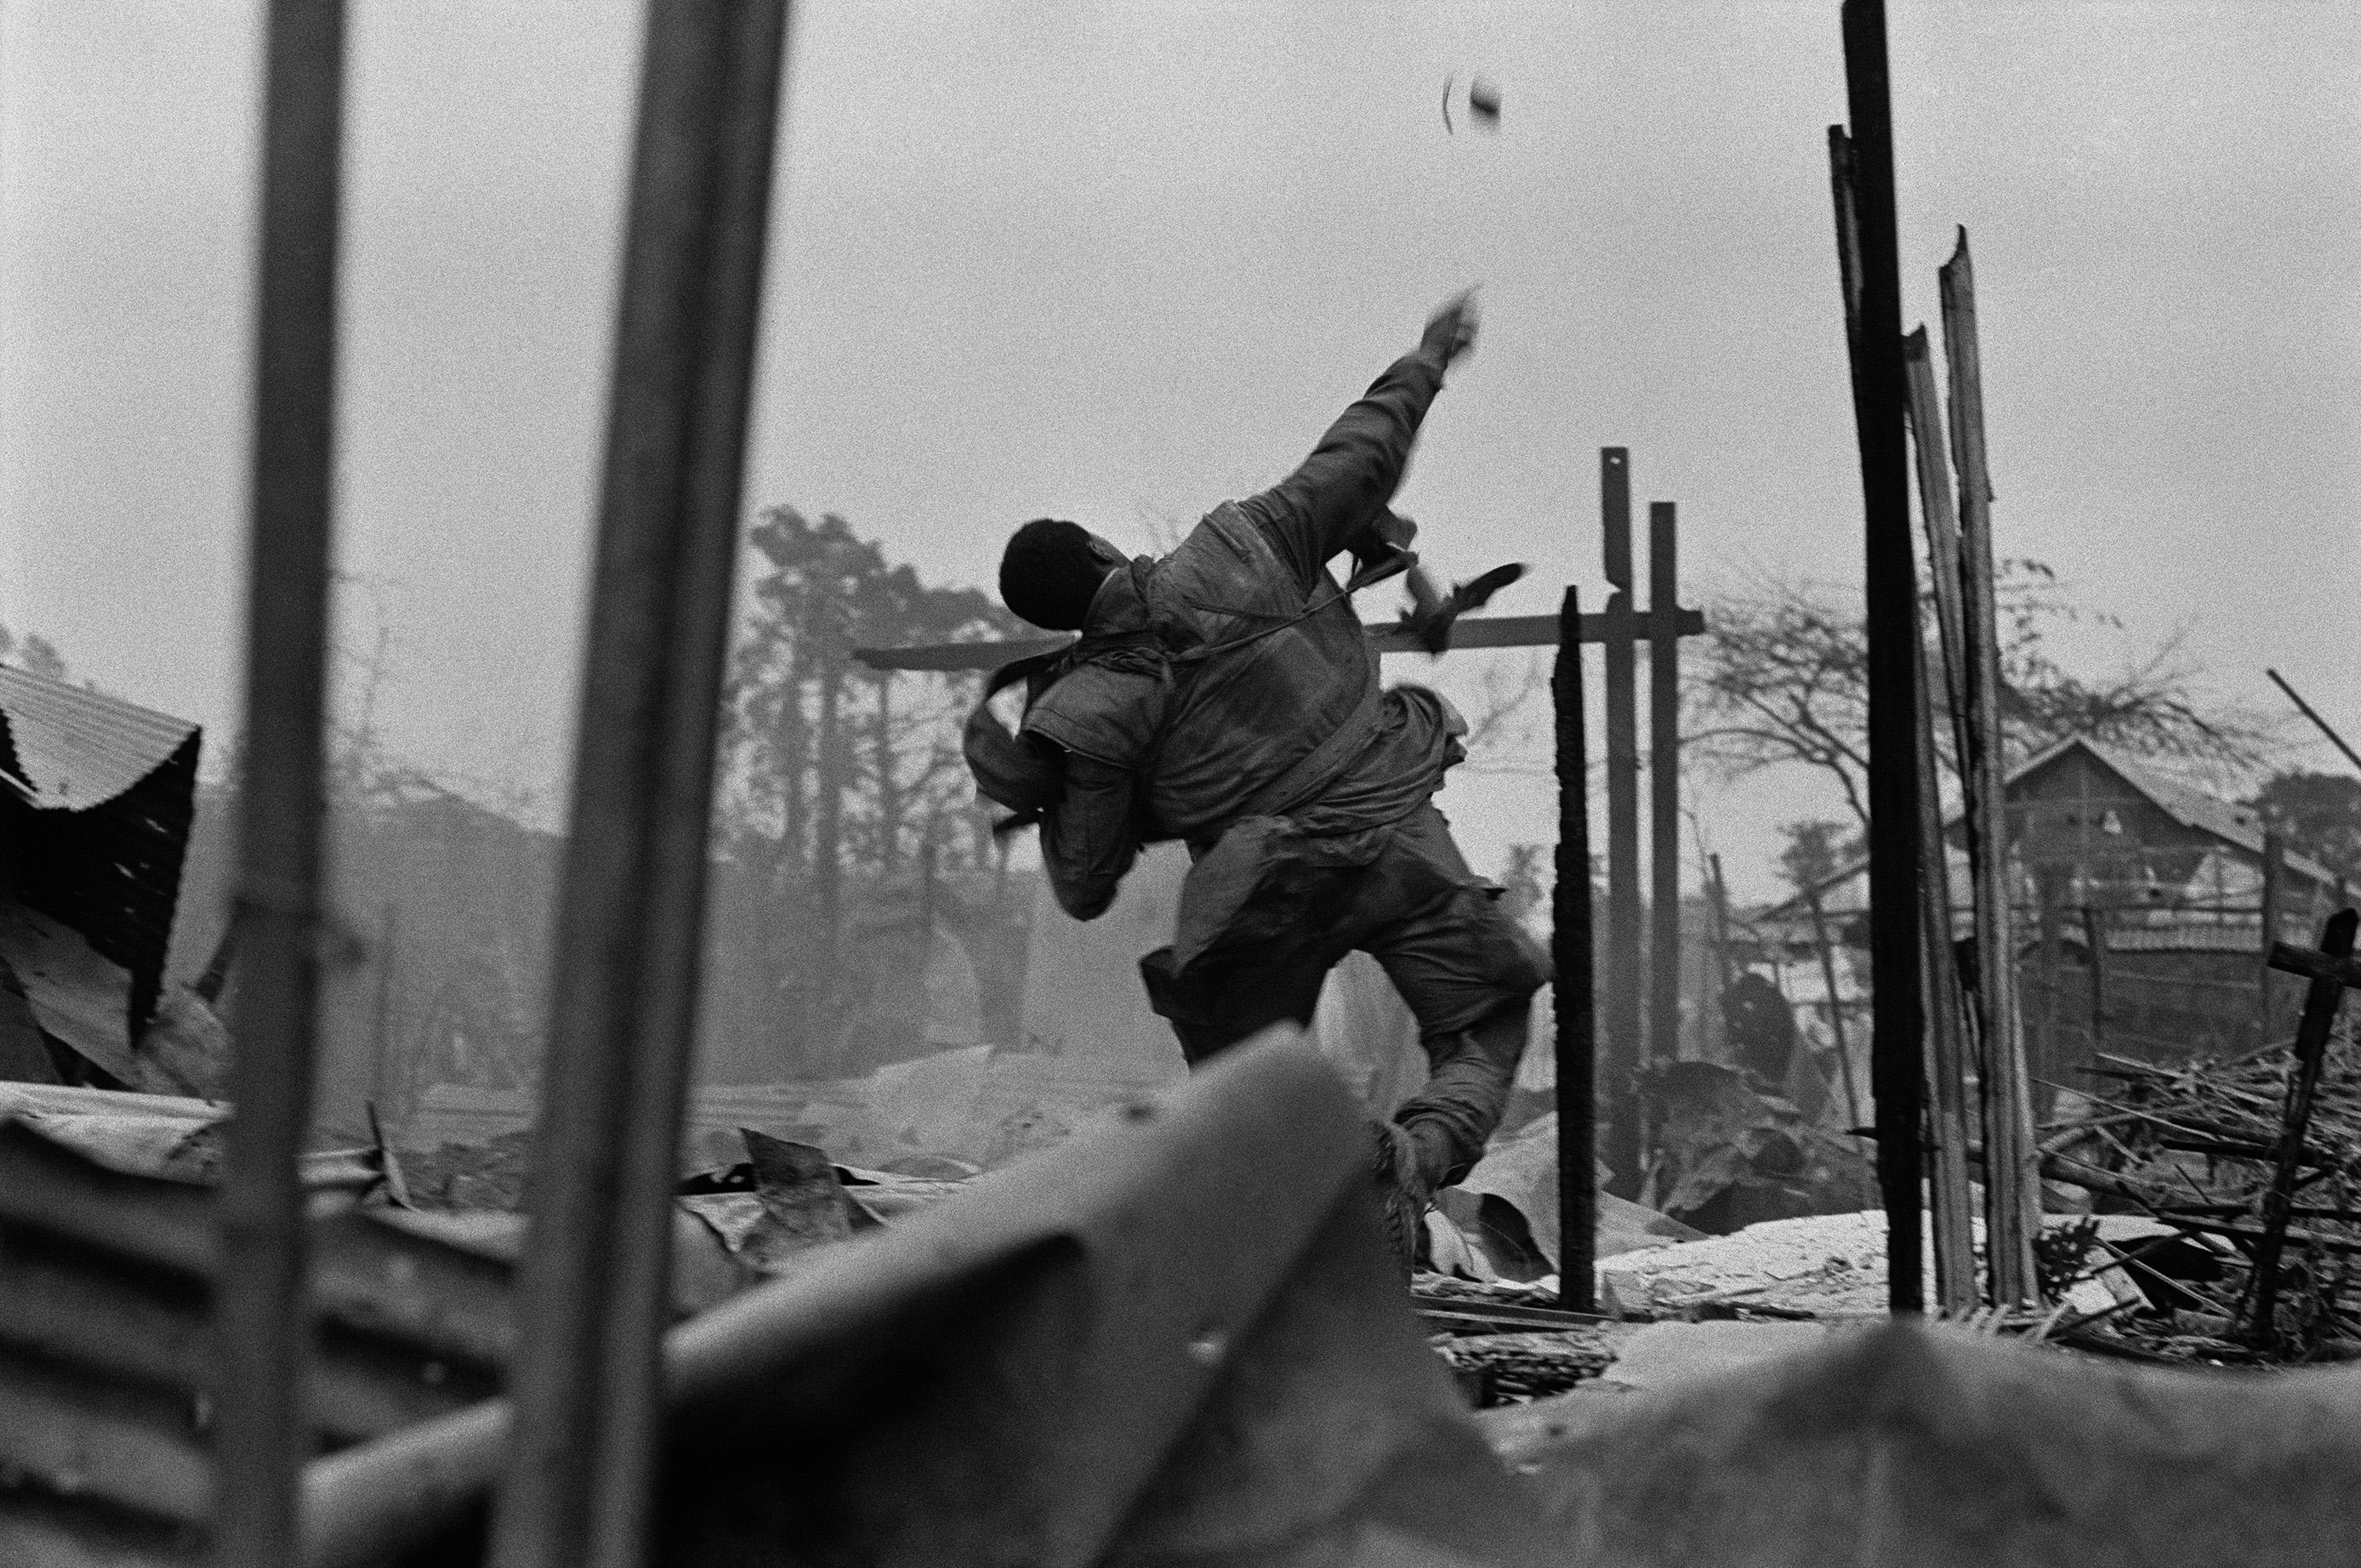 US Marine hurling grenade, Hue, 1968 © Don McCullin, Courtesy Hamiltons Gallery, London, and Folia Gallery, Paris.